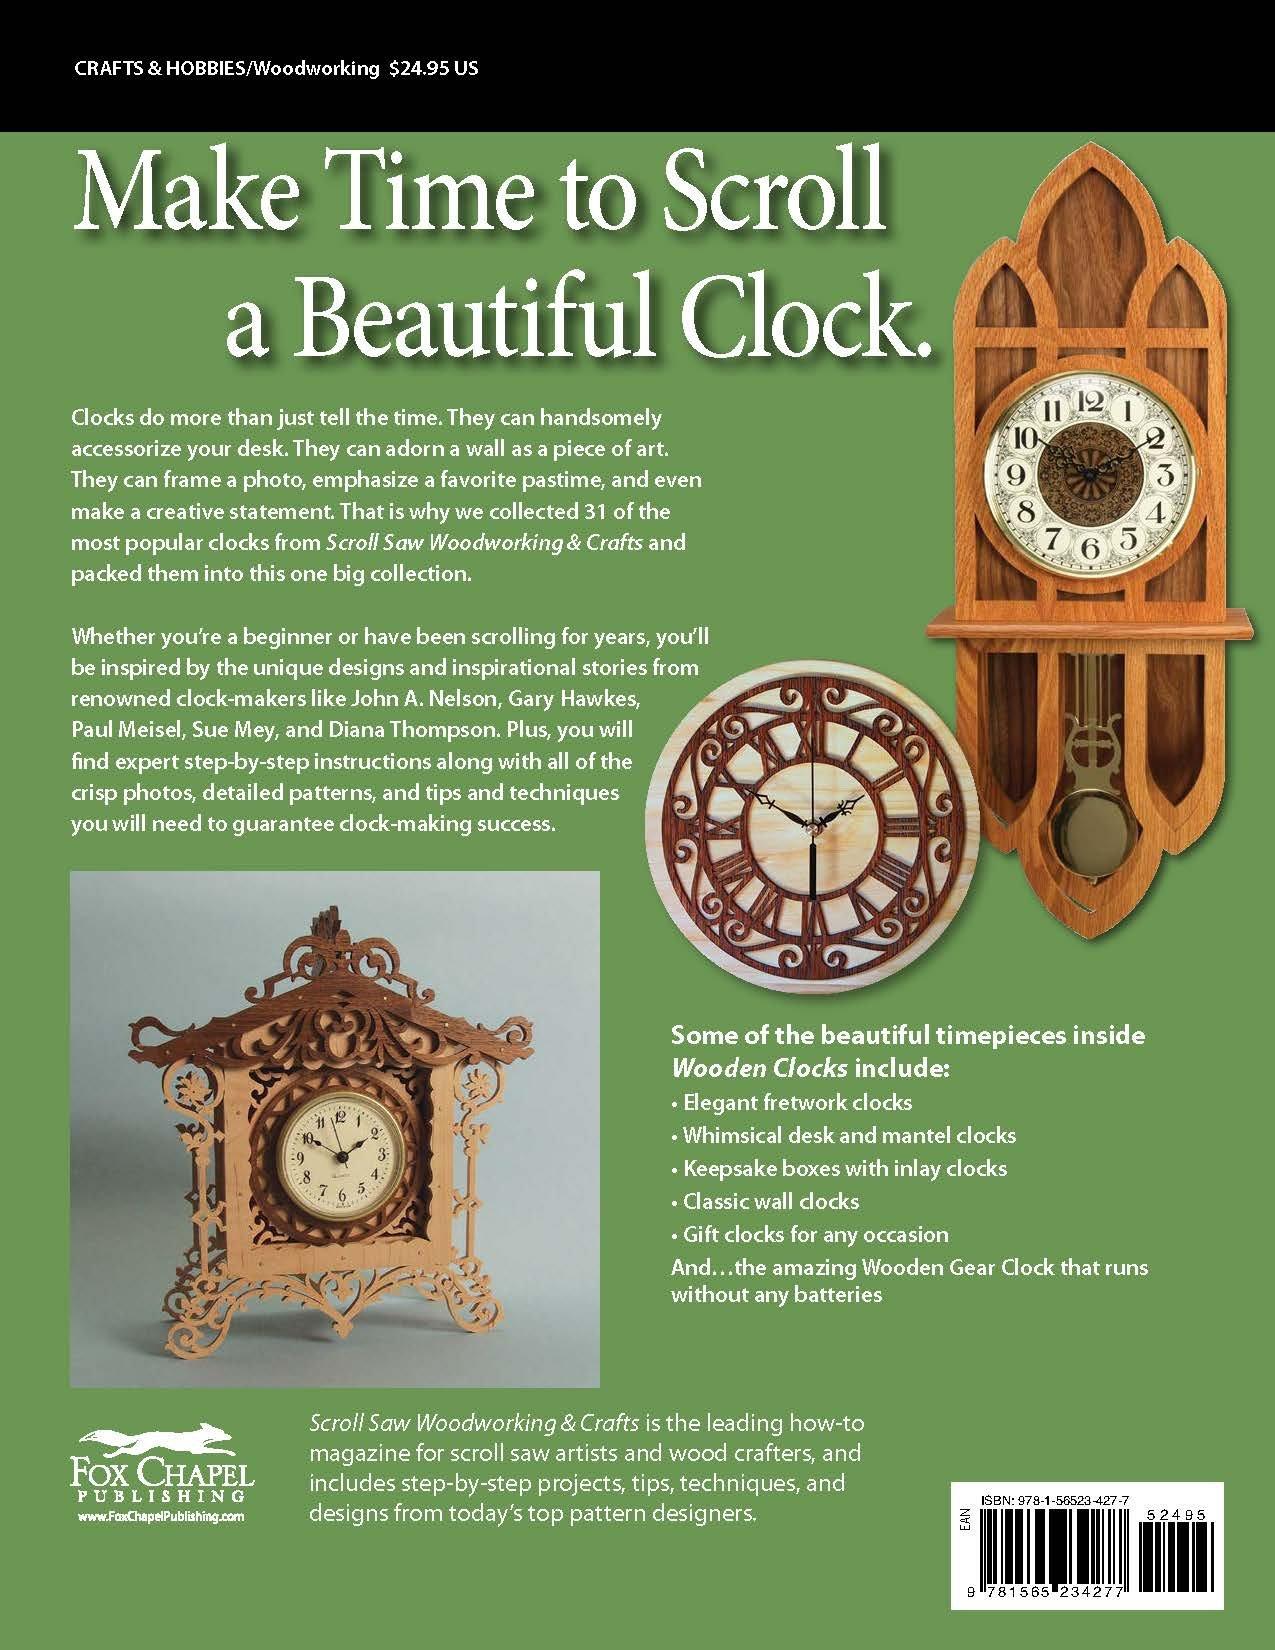 Wooden Clocks: 31 Favorite Projects U0026 Patterns (Scroll Saw Woodworking U0026  Crafts Book): Editors Of Scroll Saw Woodworking U0026 Crafts: 9781565234277: ...